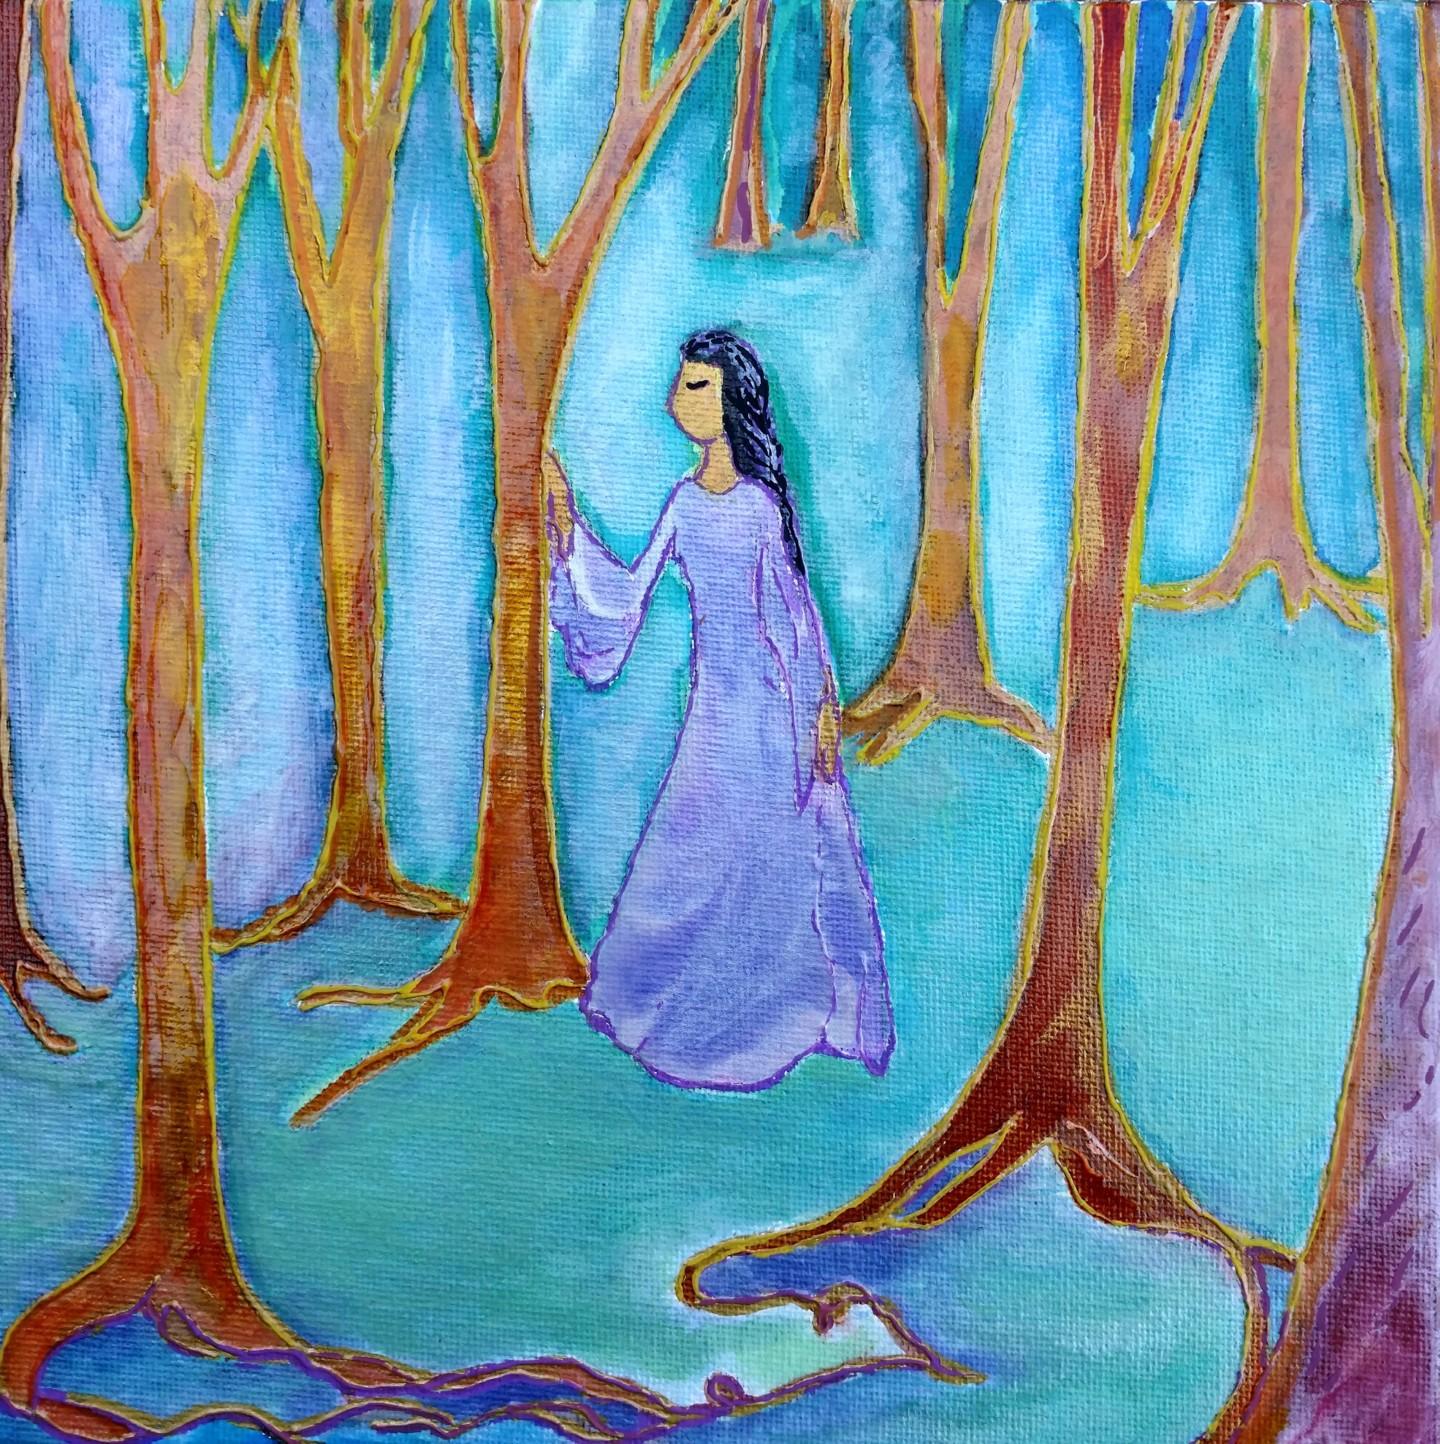 Gioia Albano - In my wood